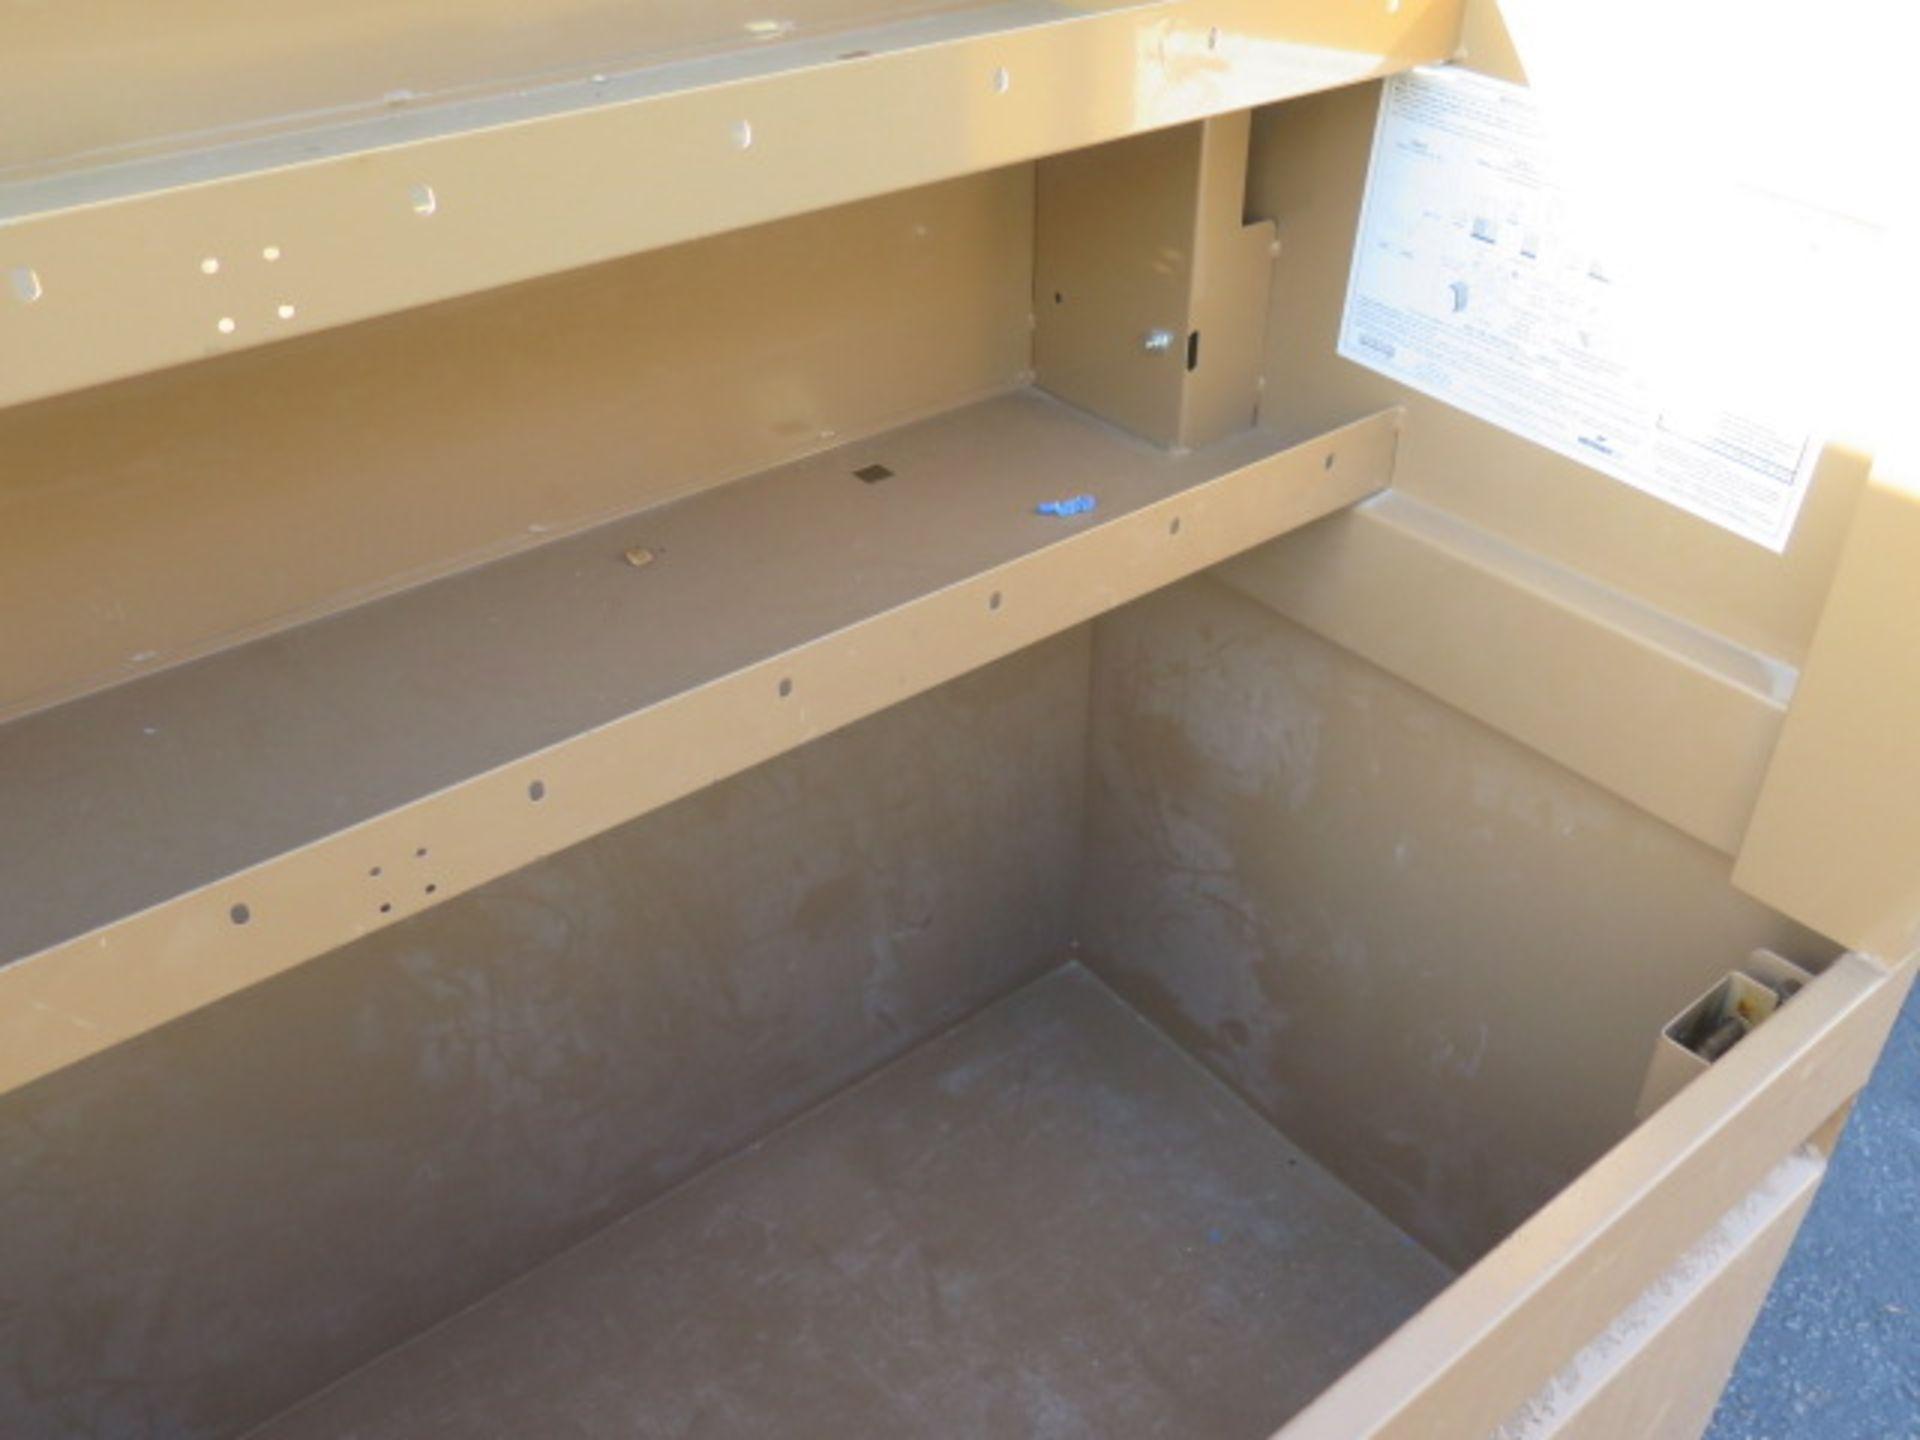 Knaack mdl. 89 Storagemaster Rolling Job Box (SOLD AS-IS - NO WARRANTY) - Image 8 of 11